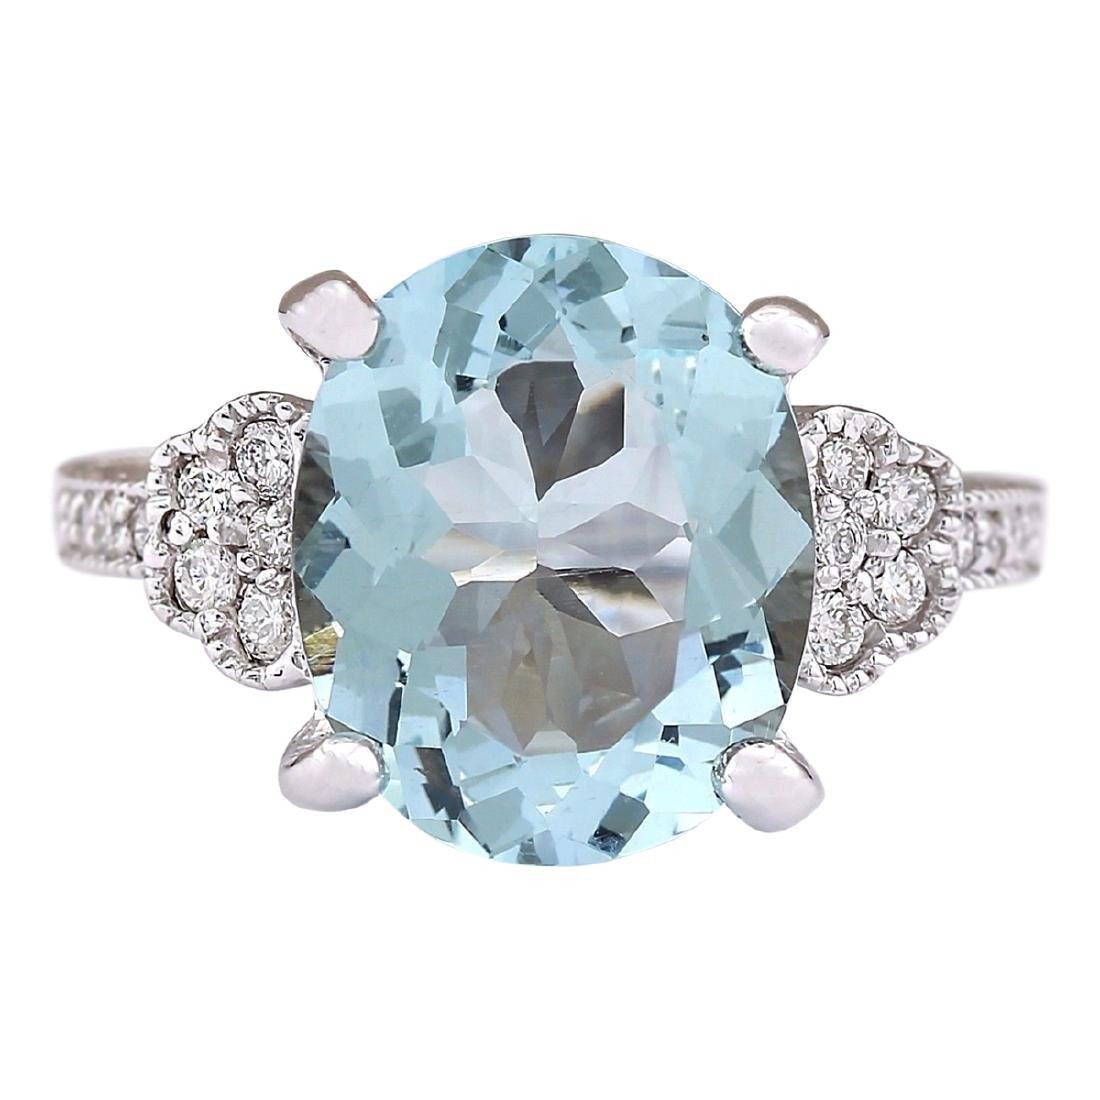 5.89 CTW Natural Aquamarine And Diamond Ring In 18K